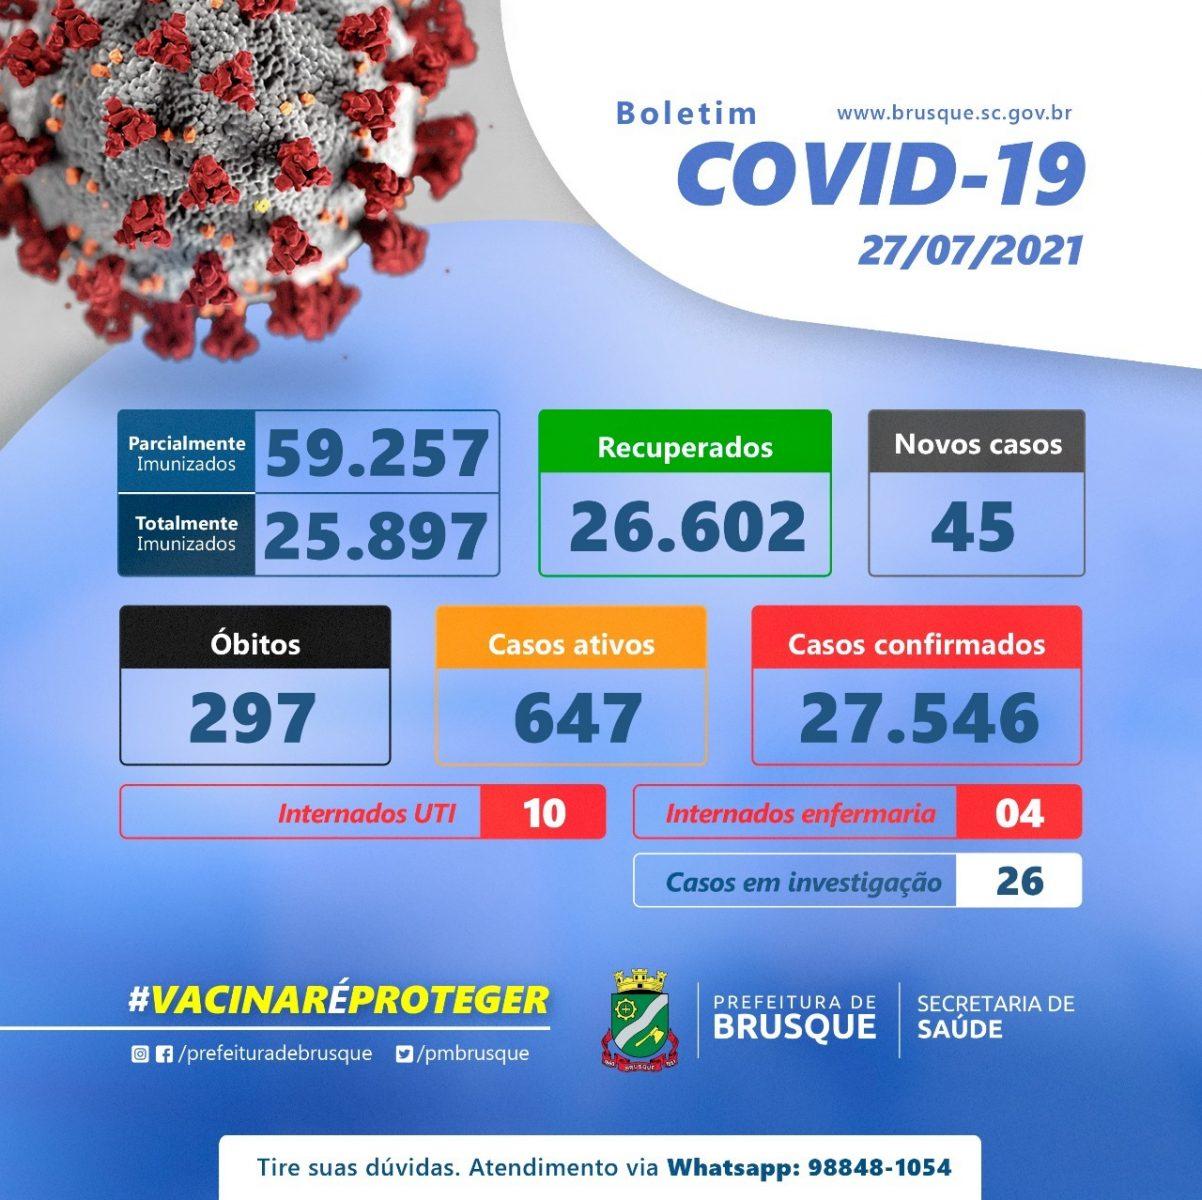 Covid-19: Confira o boletim epidemiológico desta terça-feira (27)